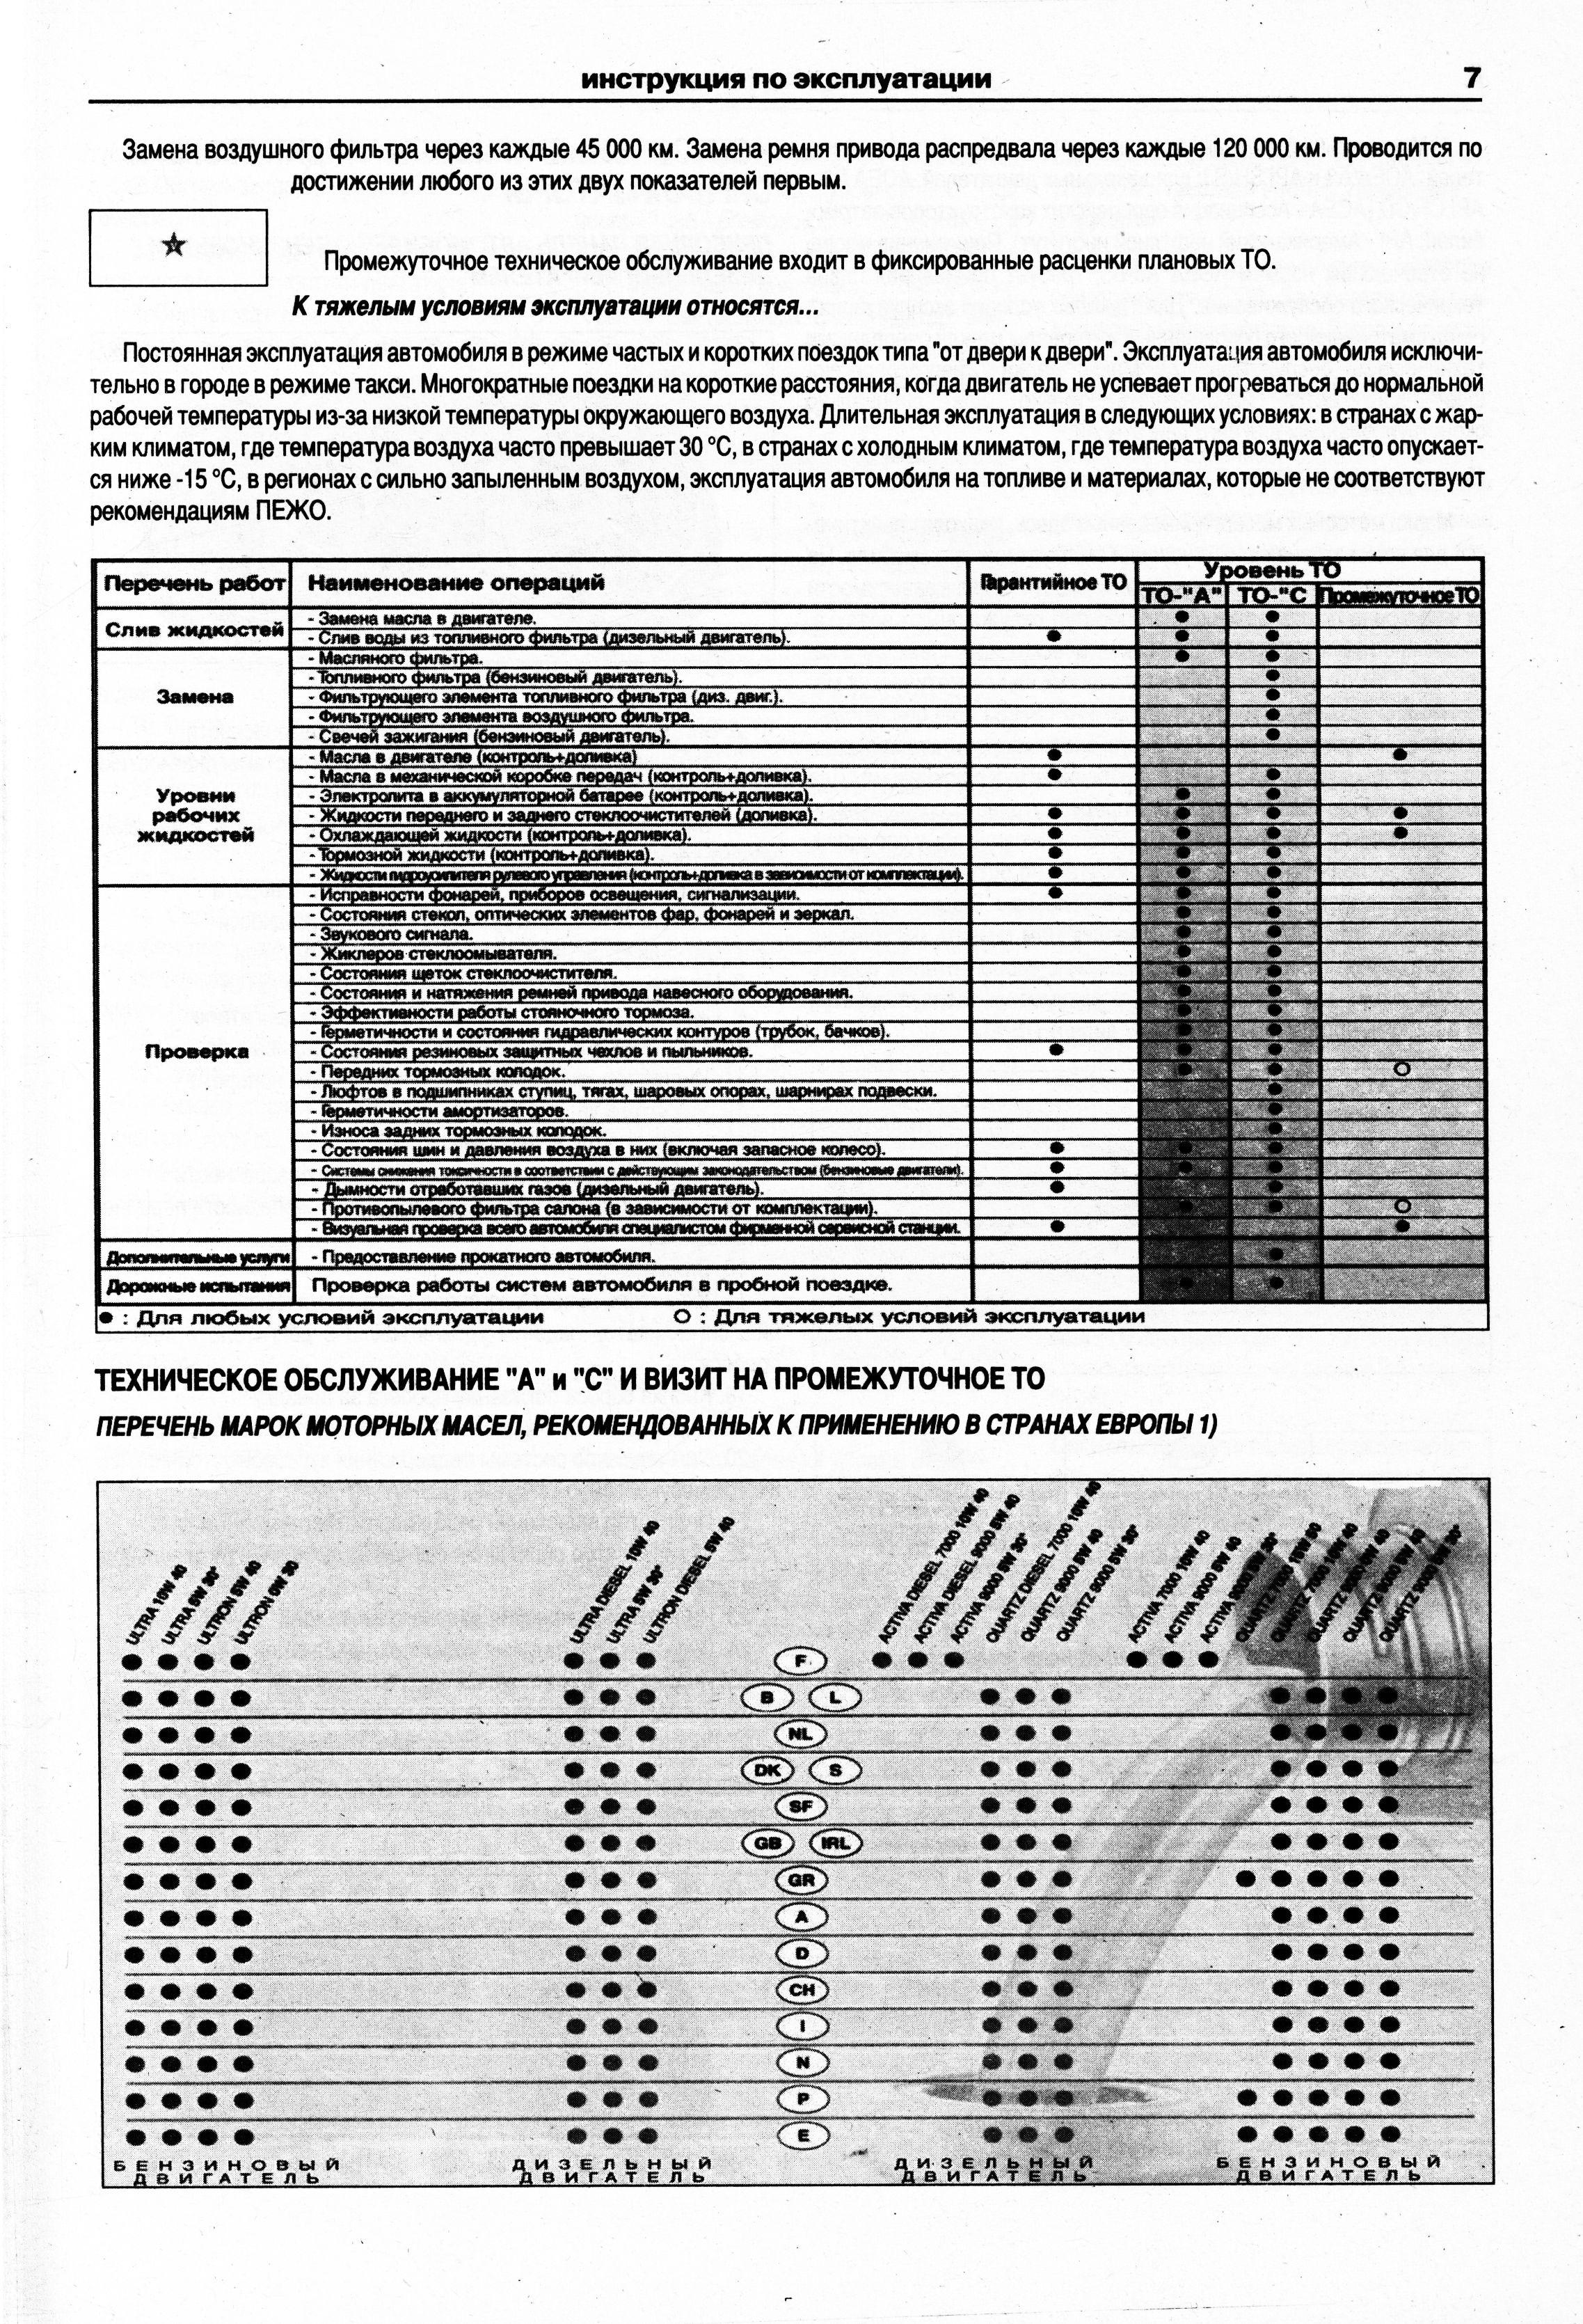 инструкция по эксплуатации peugeot expert 2005 г